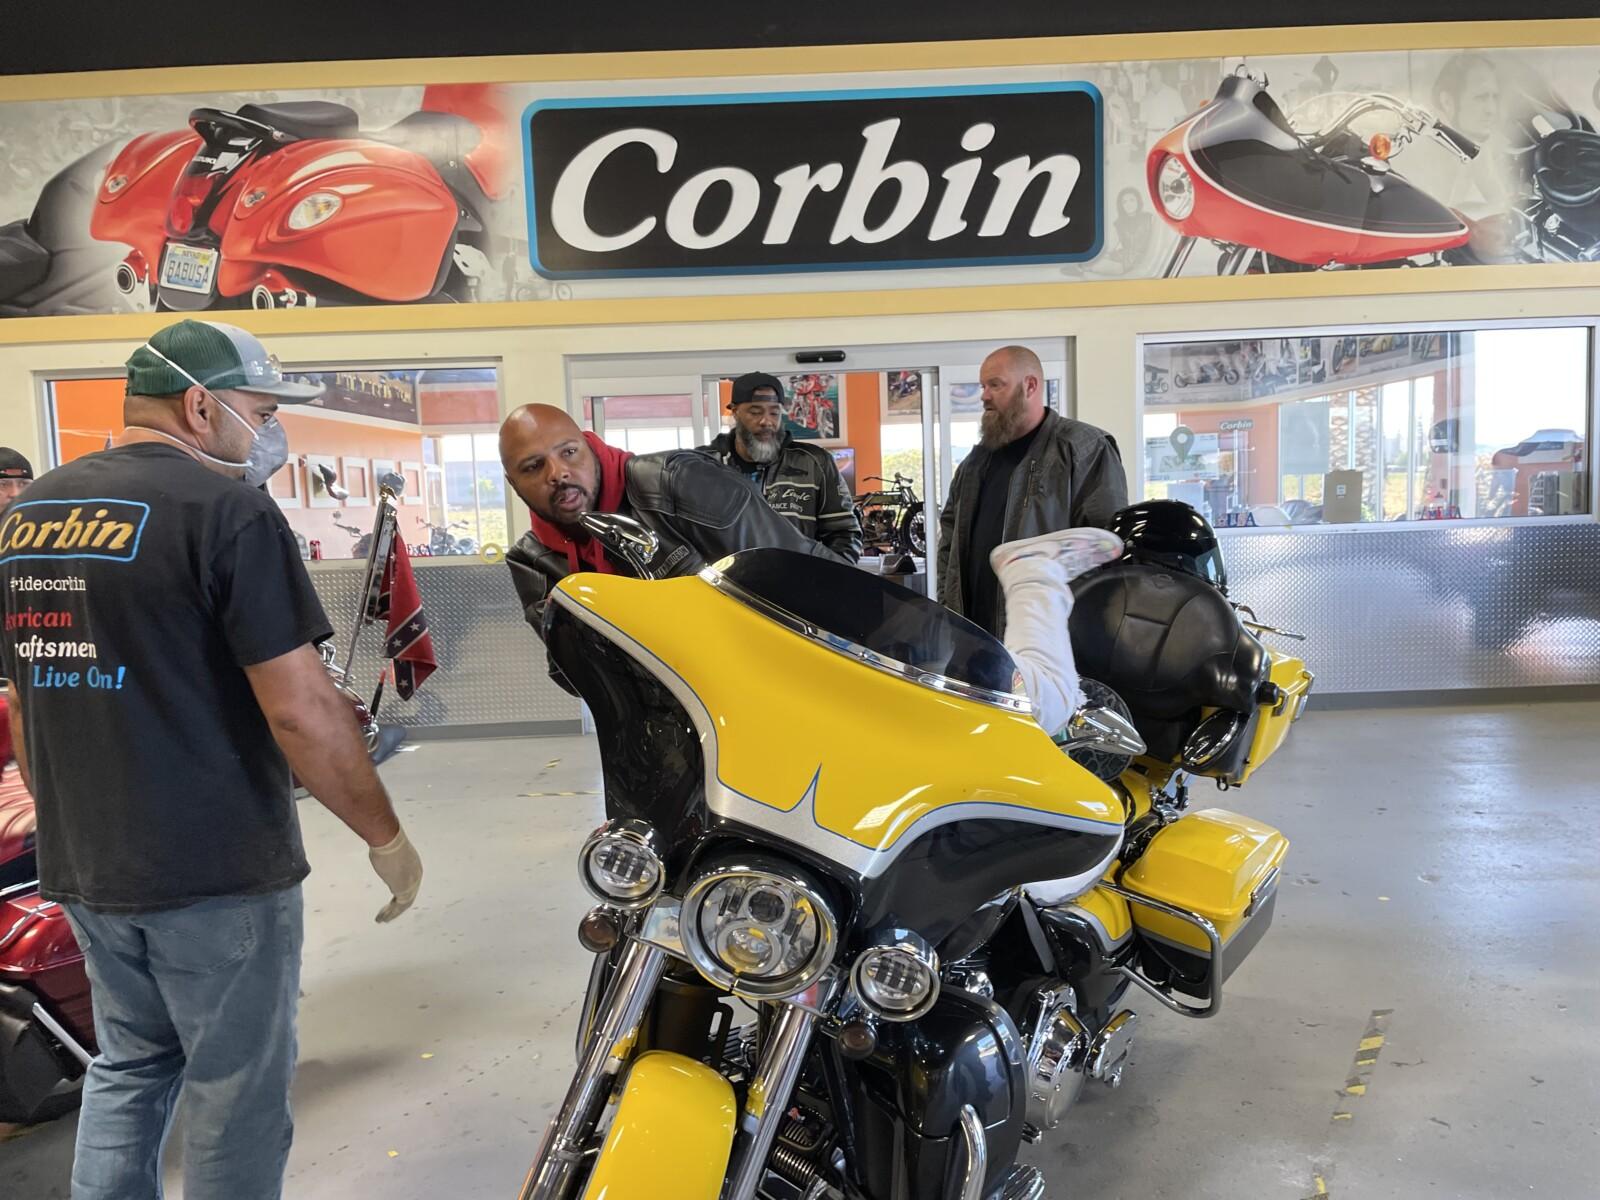 Corbin Ride-In Workshop